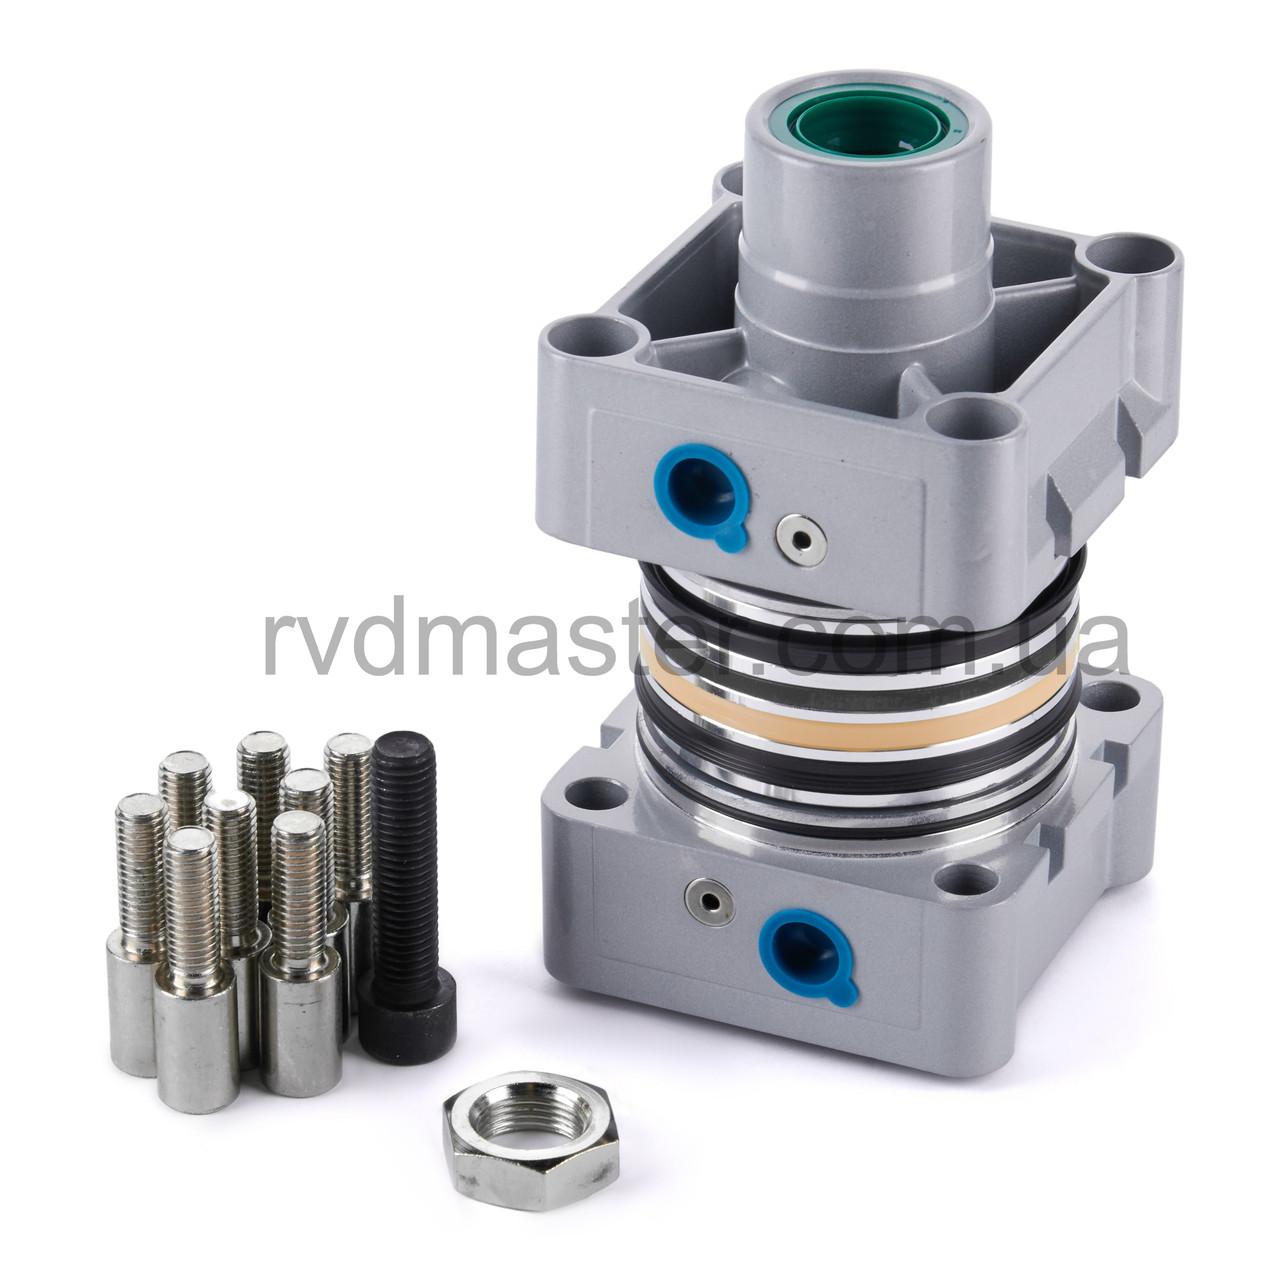 Комплект для сборки пневматического цилиндра, диаметром поршня 80mm